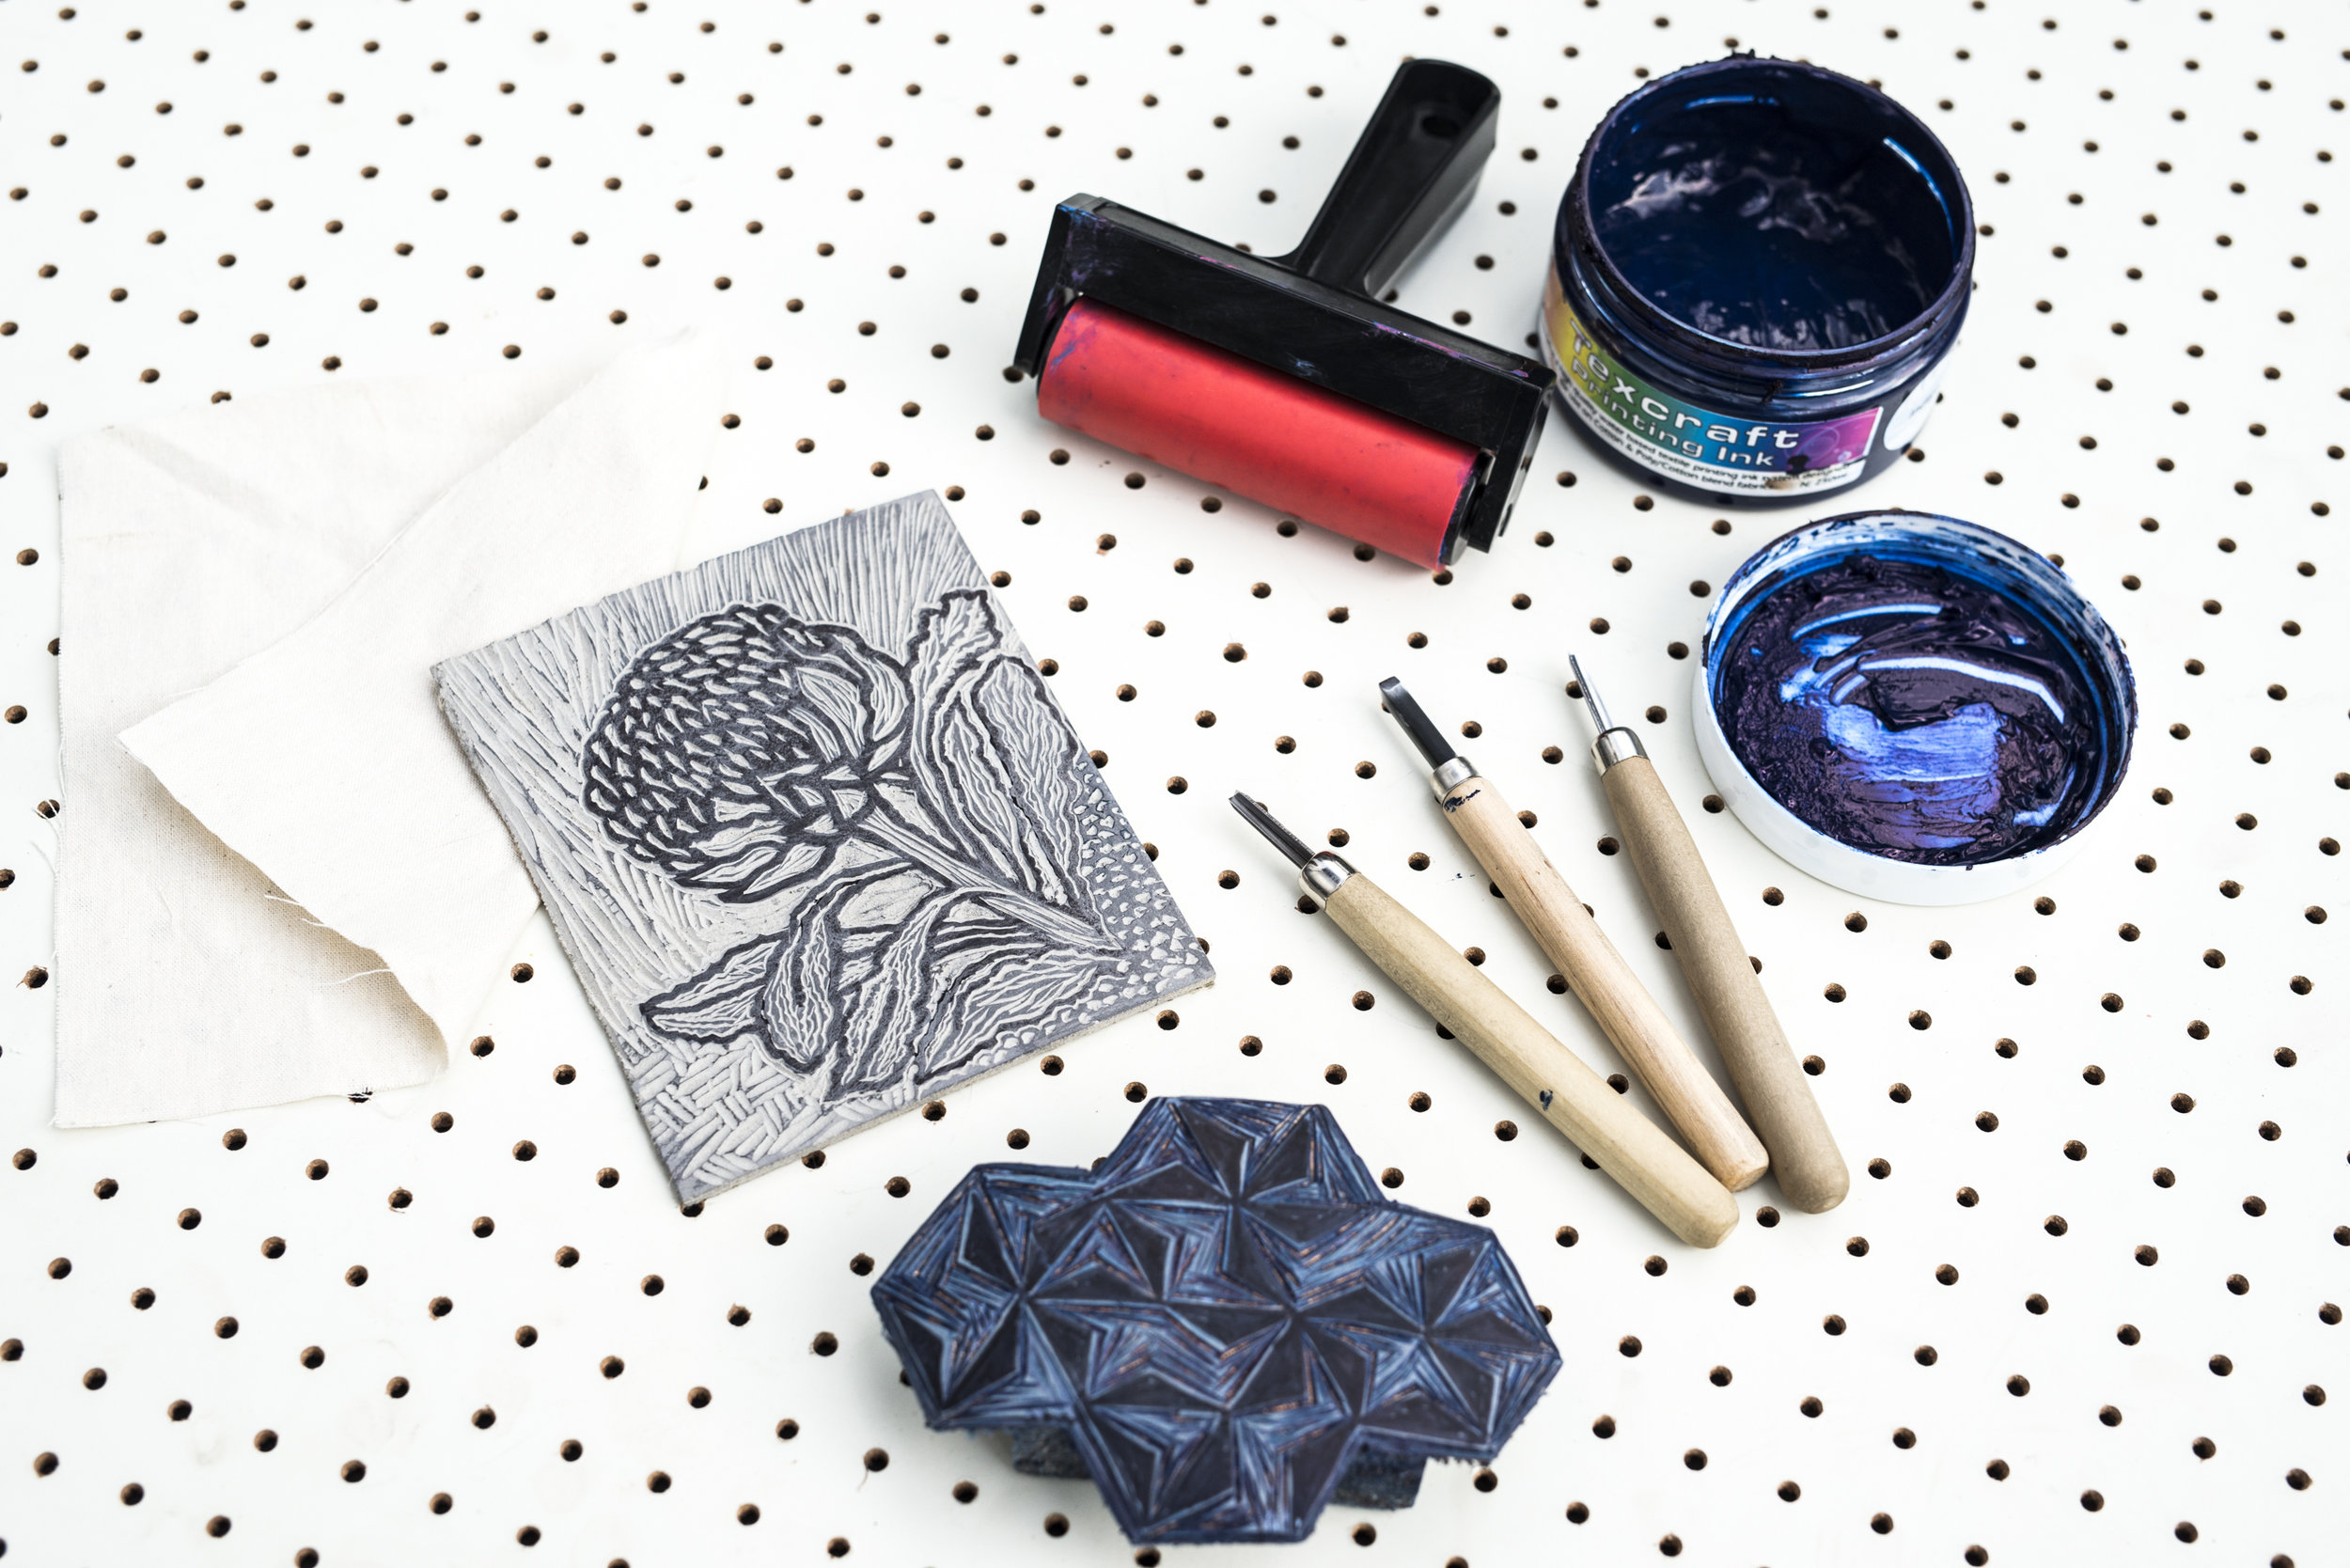 PYHII - Embroidery_35.jpg